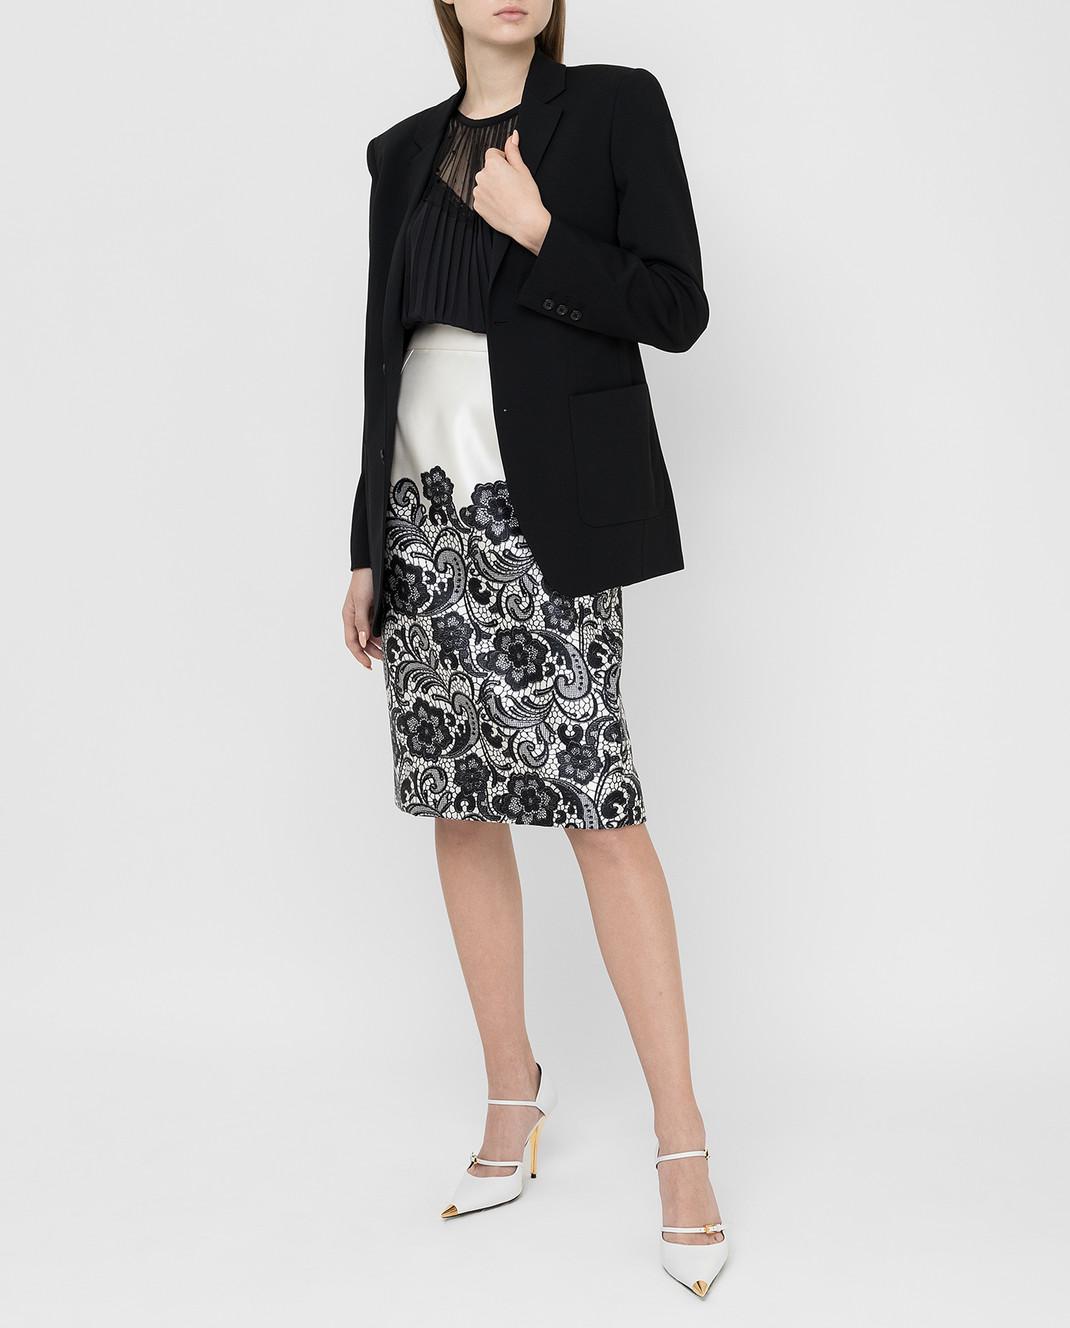 Dolce&Gabbana Светло-бежевая юбка из шелка F4T32TFS1YX изображение 2